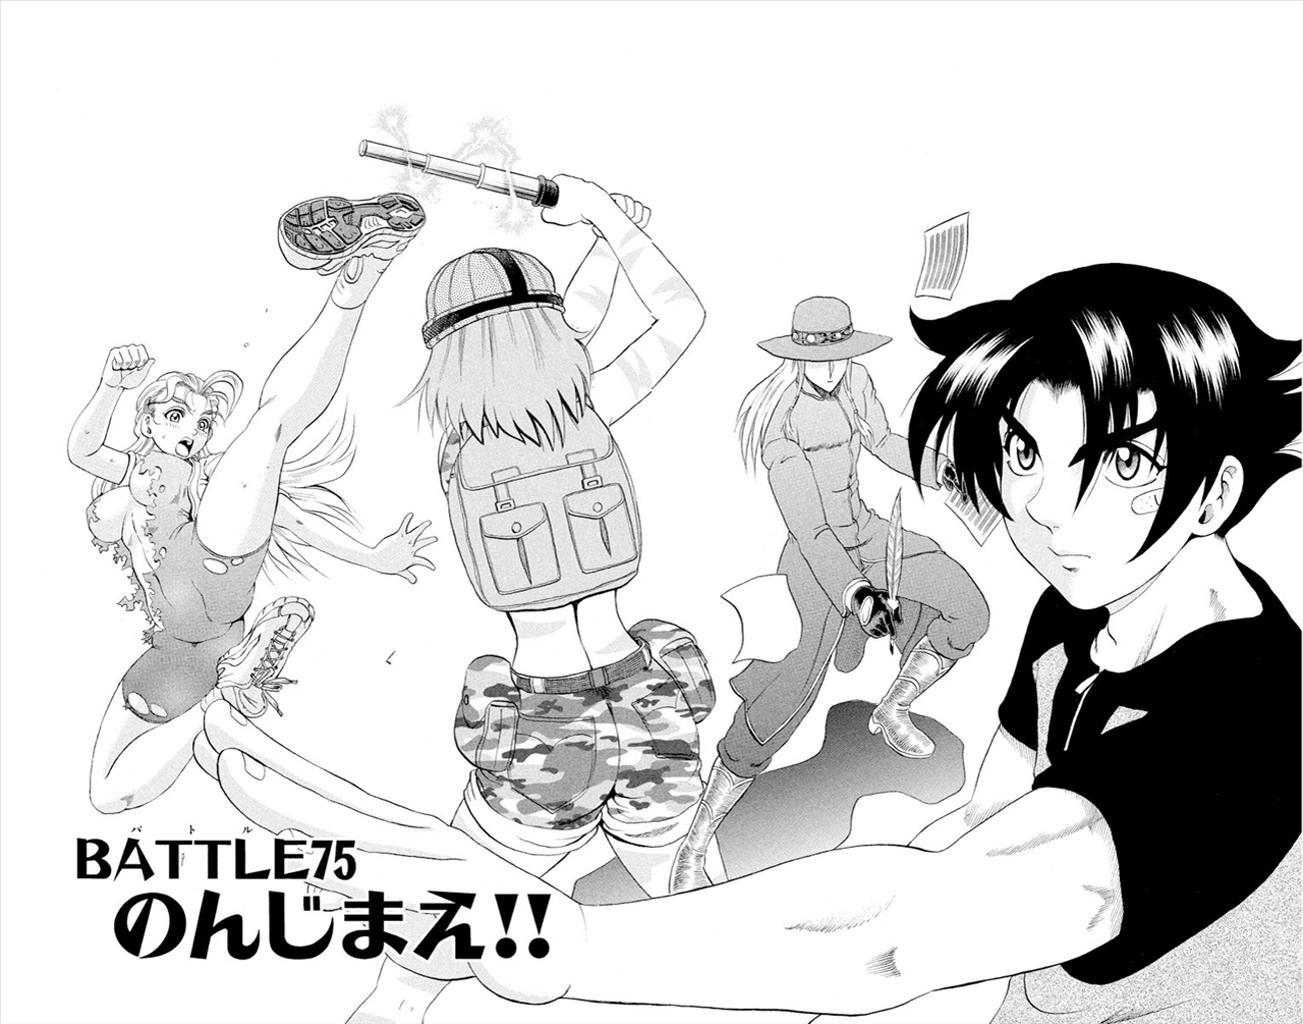 Battle 75